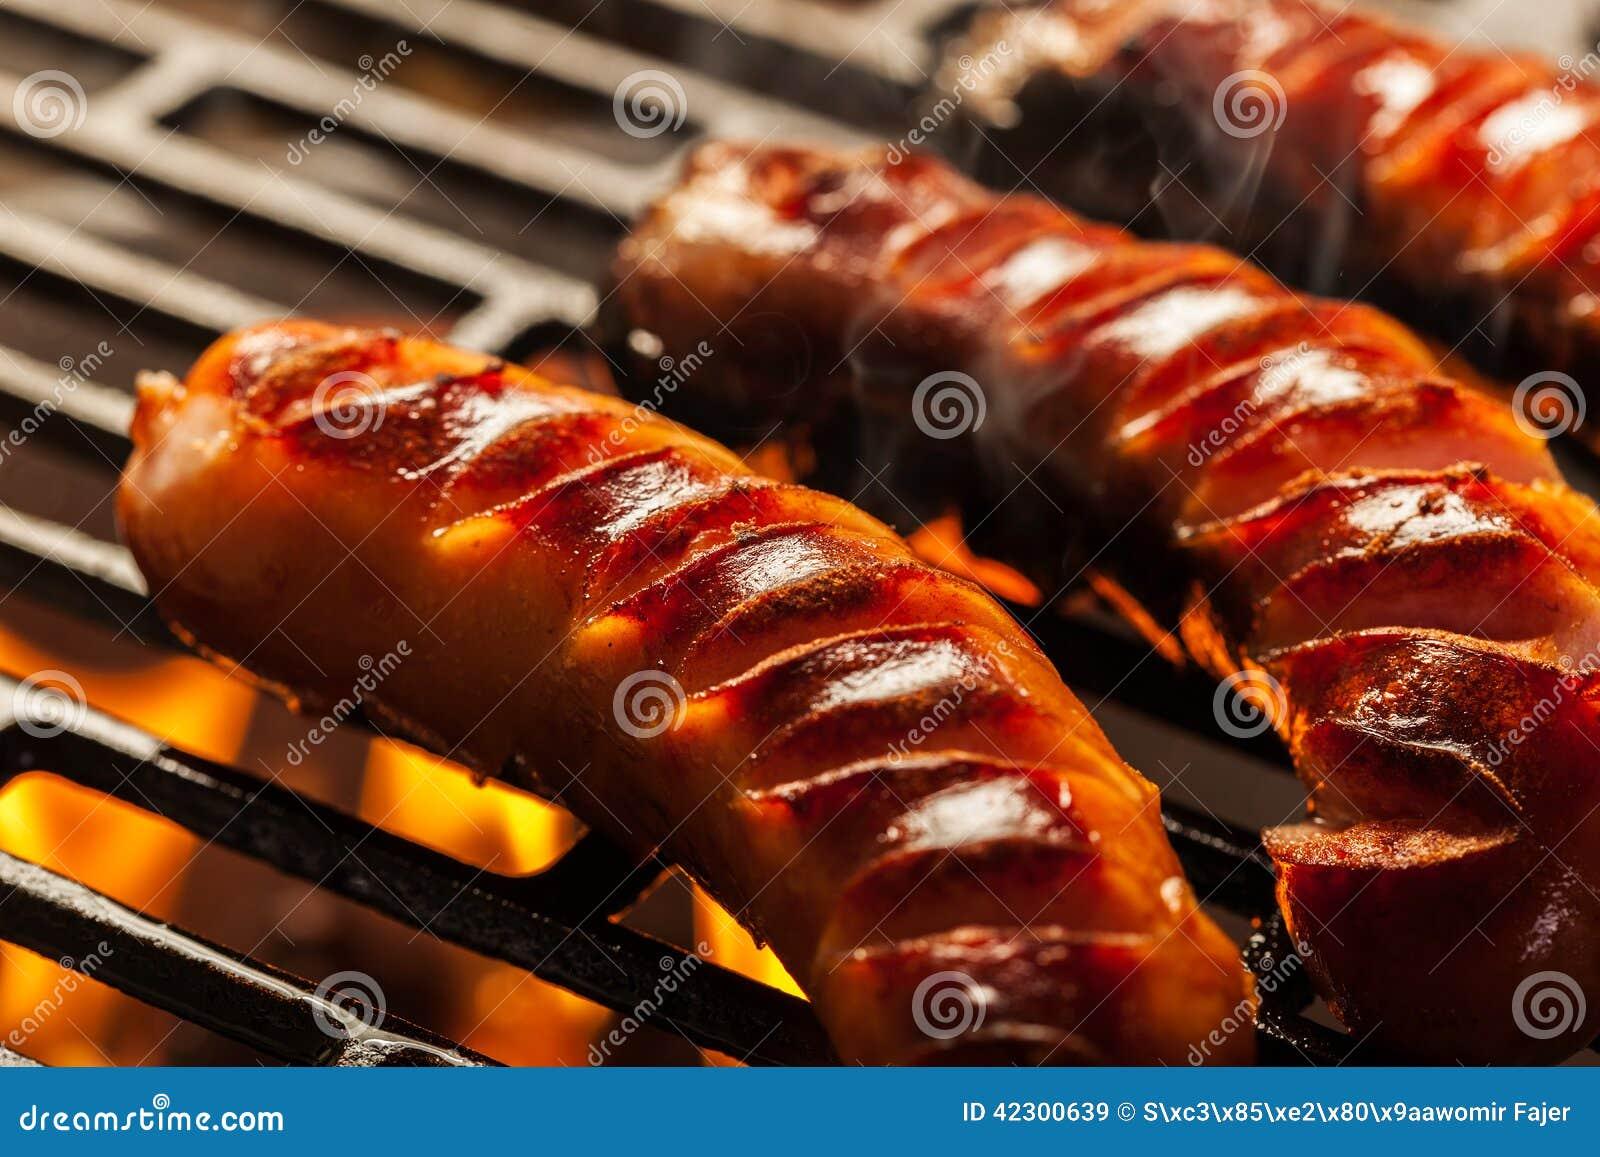 grilling sausages on barbecue grill stock image image. Black Bedroom Furniture Sets. Home Design Ideas